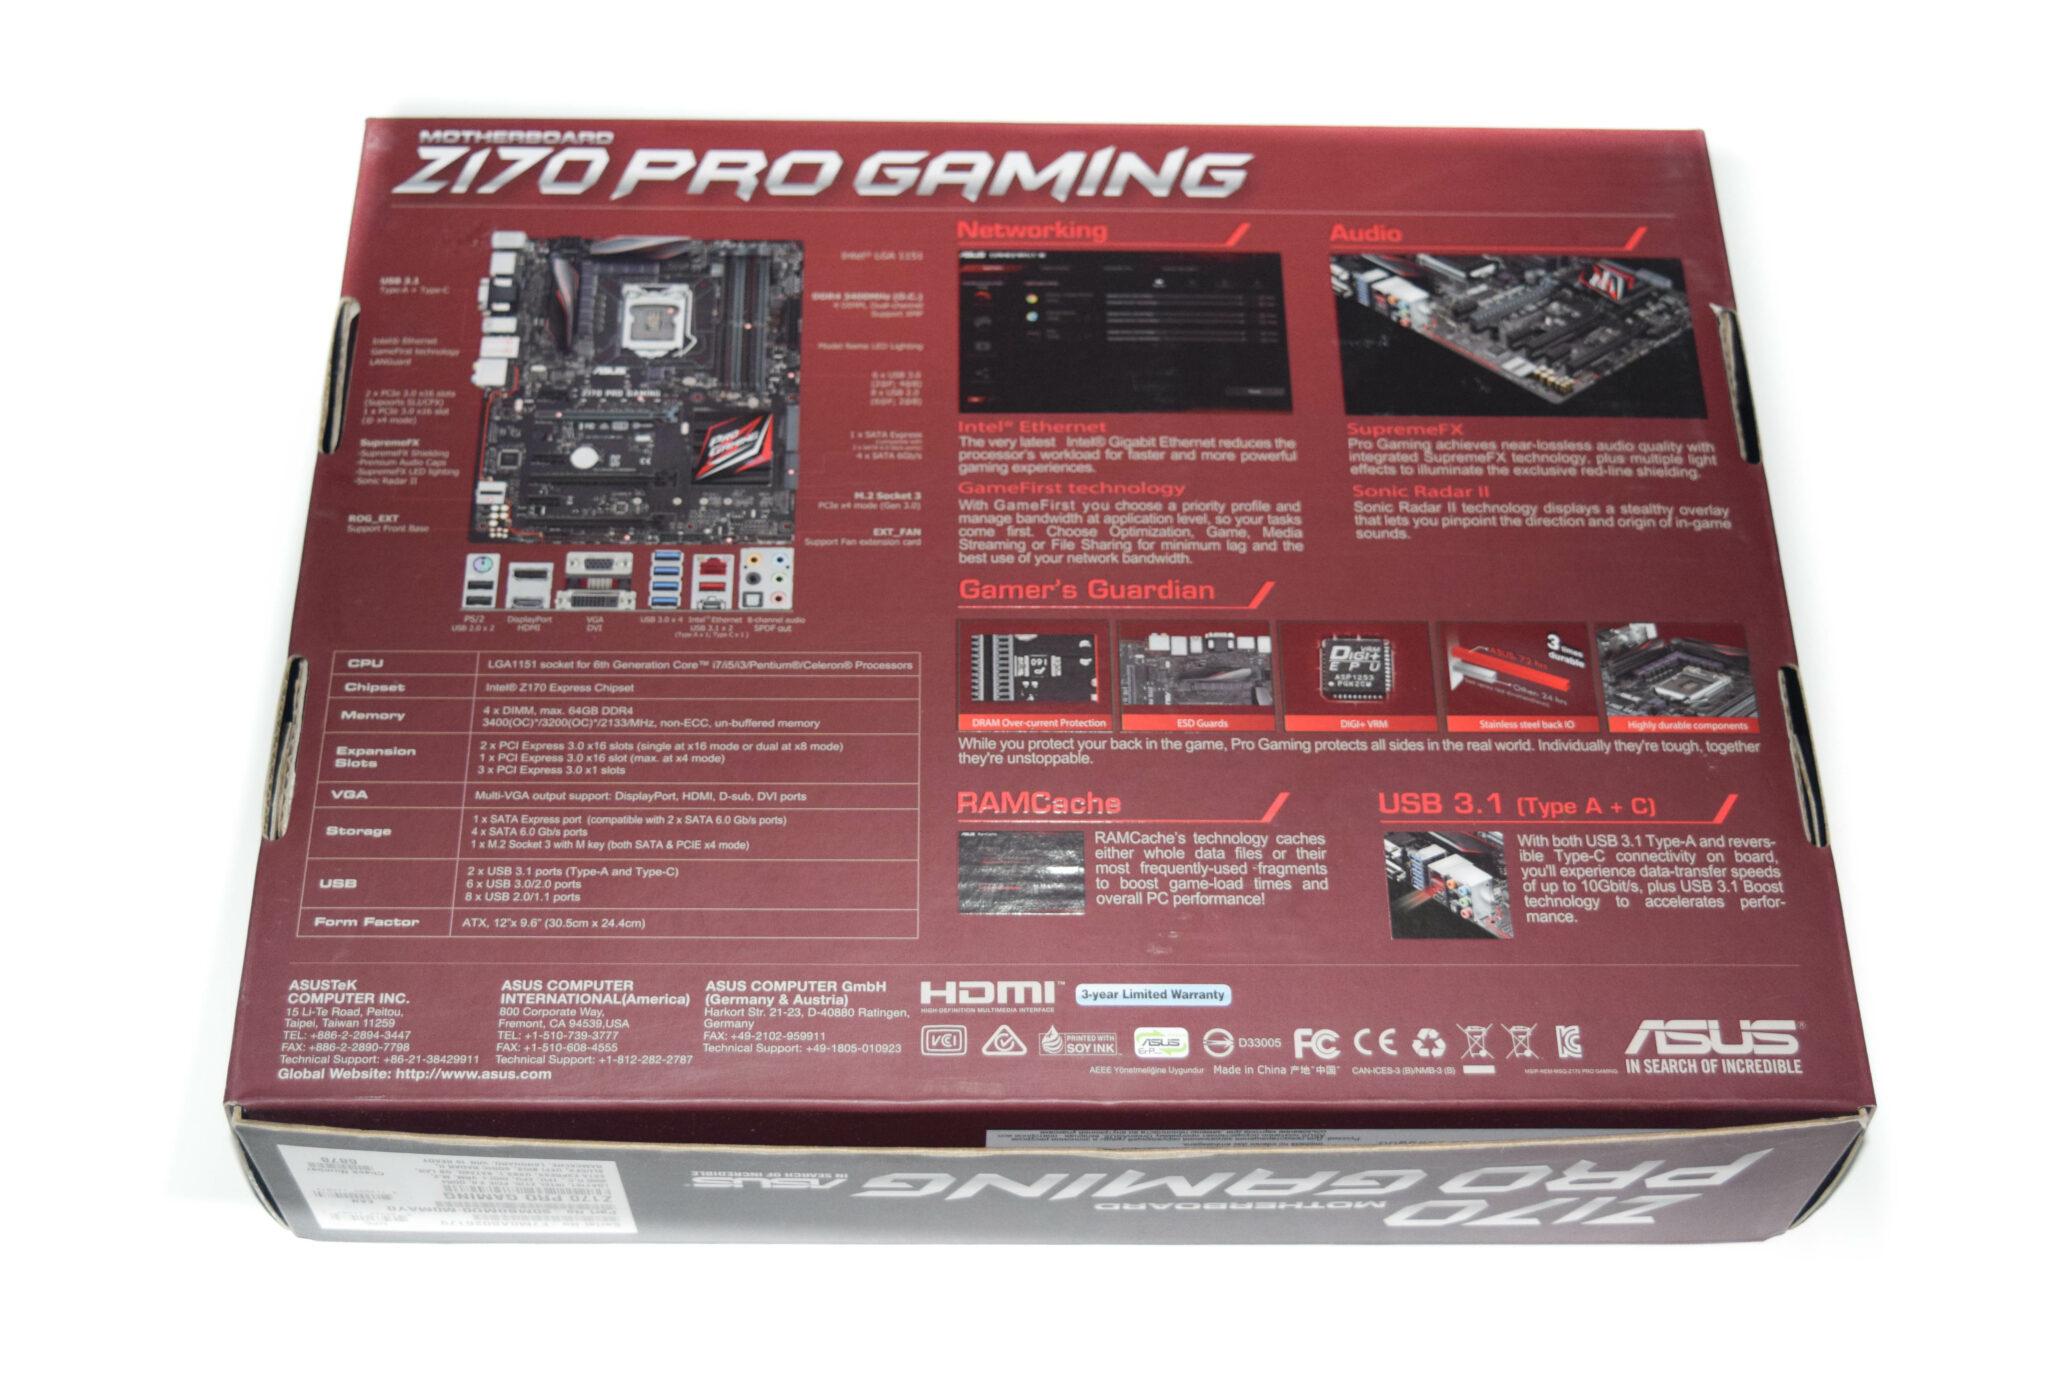 asus-z170-pro-gaming-motherboard_box-back